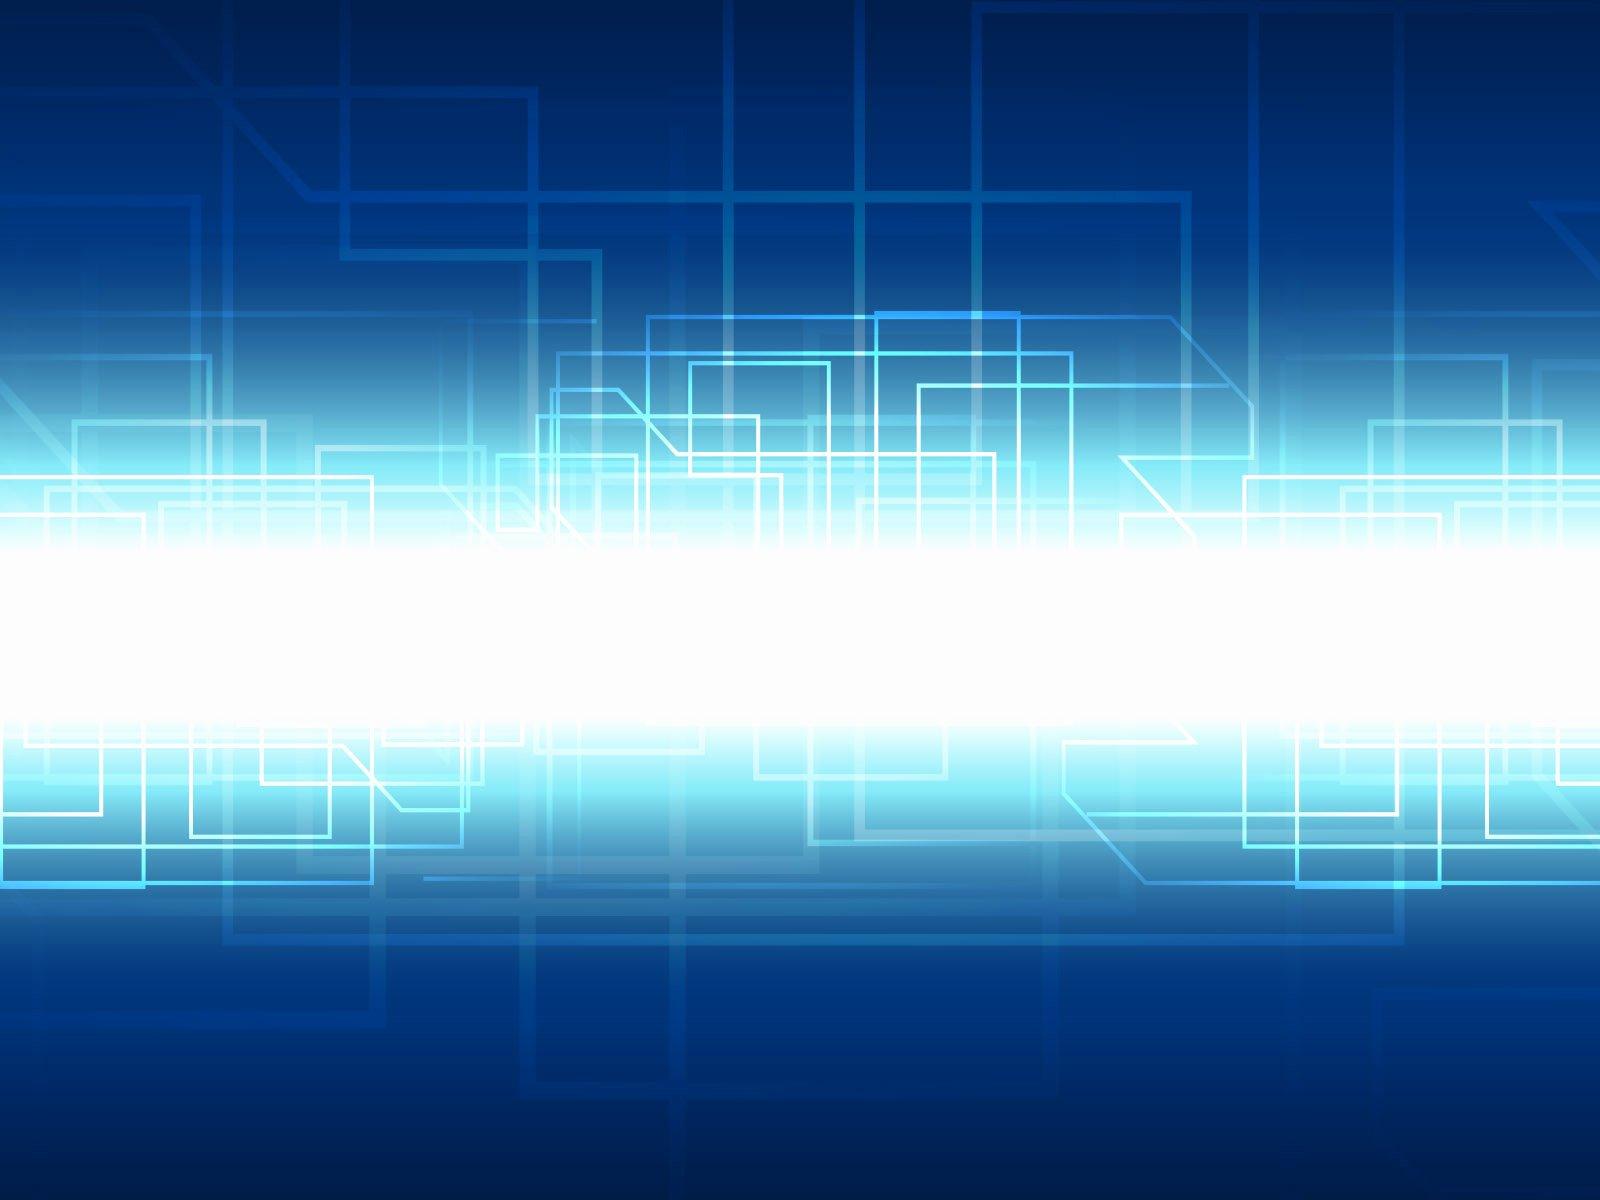 Puter System Powerpoint Templates Aqua Cyan Blue